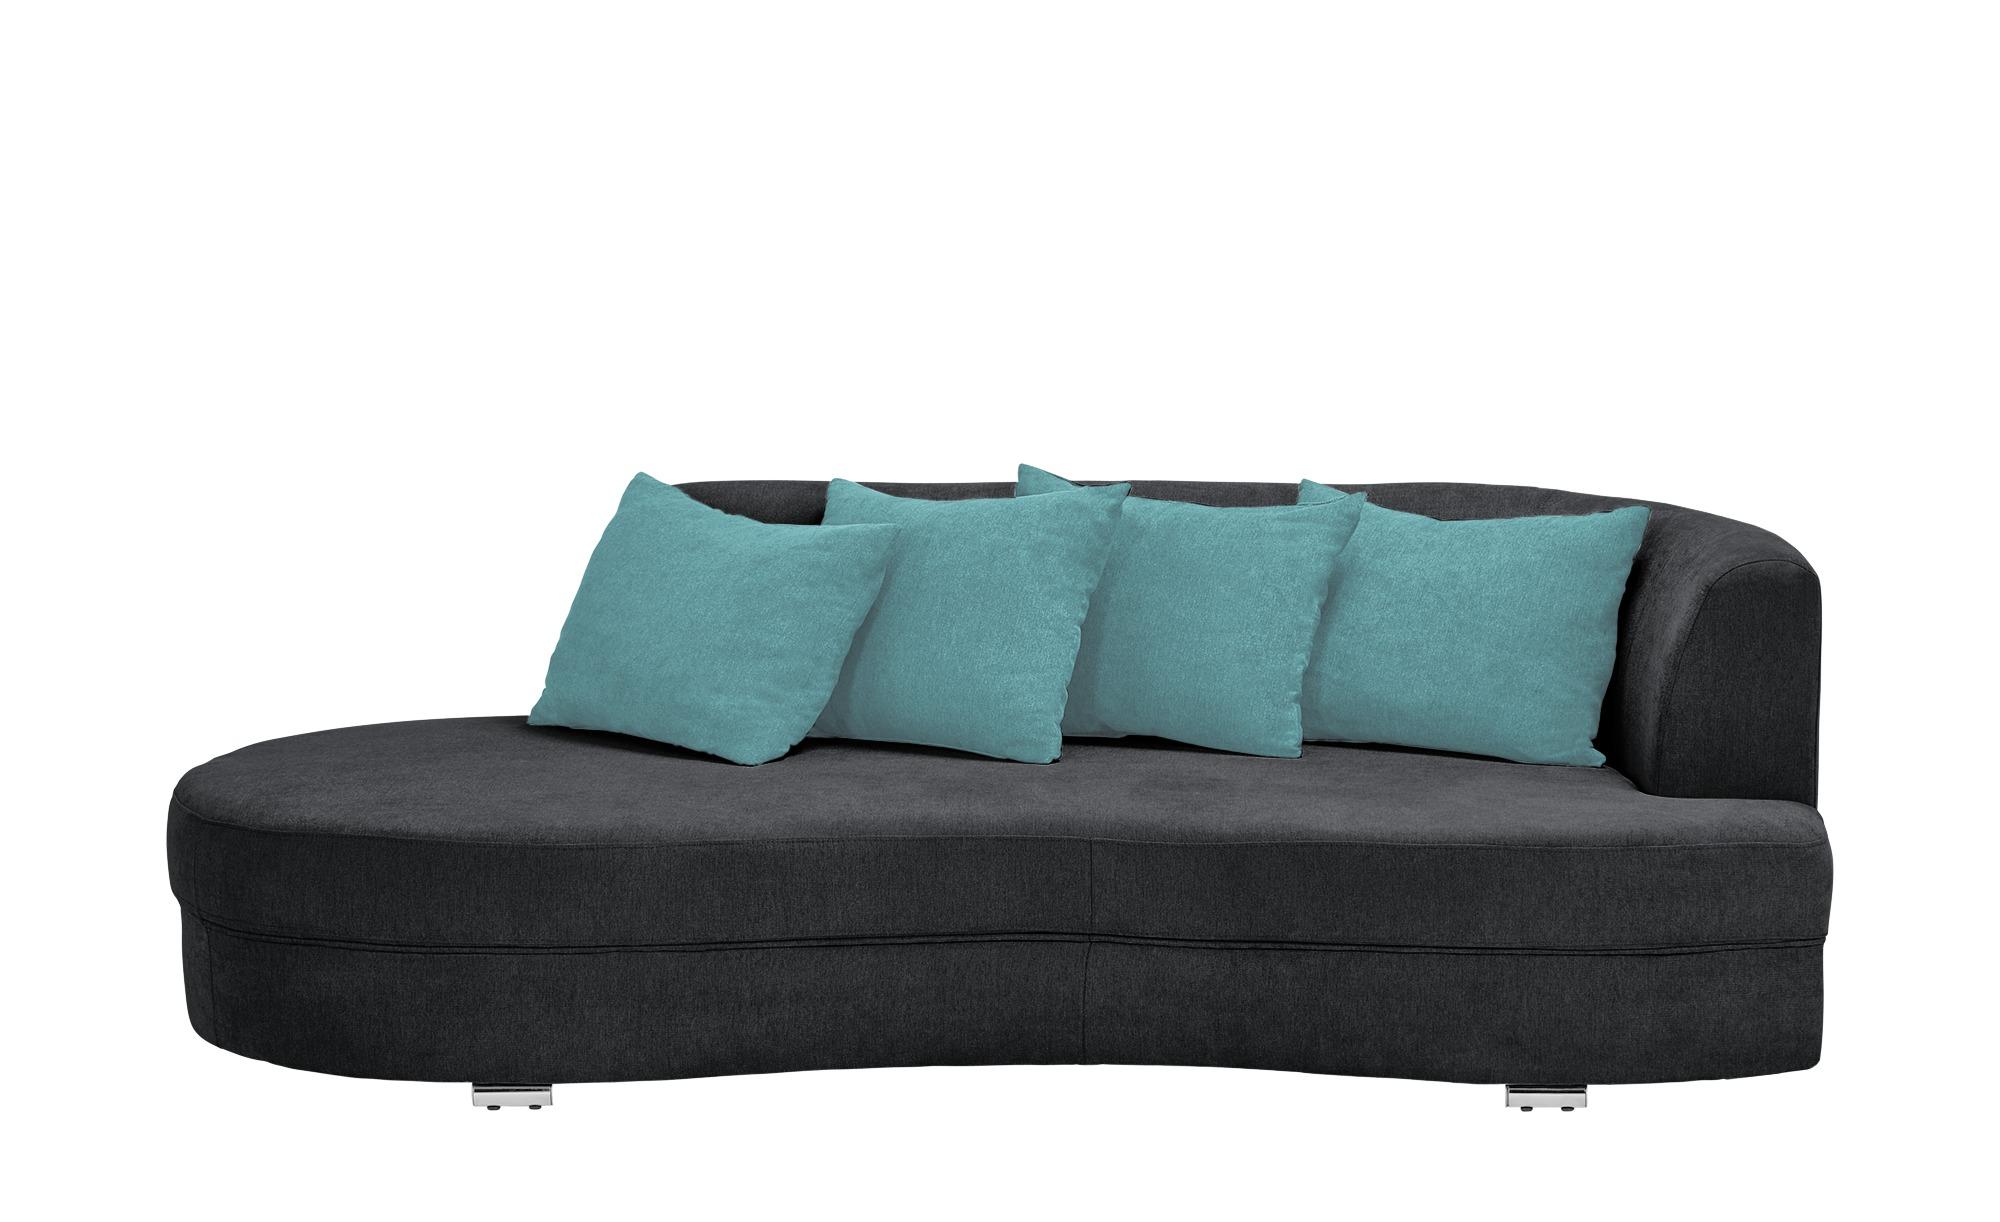 smart Big Sofa schwarz - Flachgewebe Marina ¦ schwarz ¦ Maße (cm): B: 211 H: 69 T: 109 Polstermöbel > Sofas > Big-Sofas - Höffner